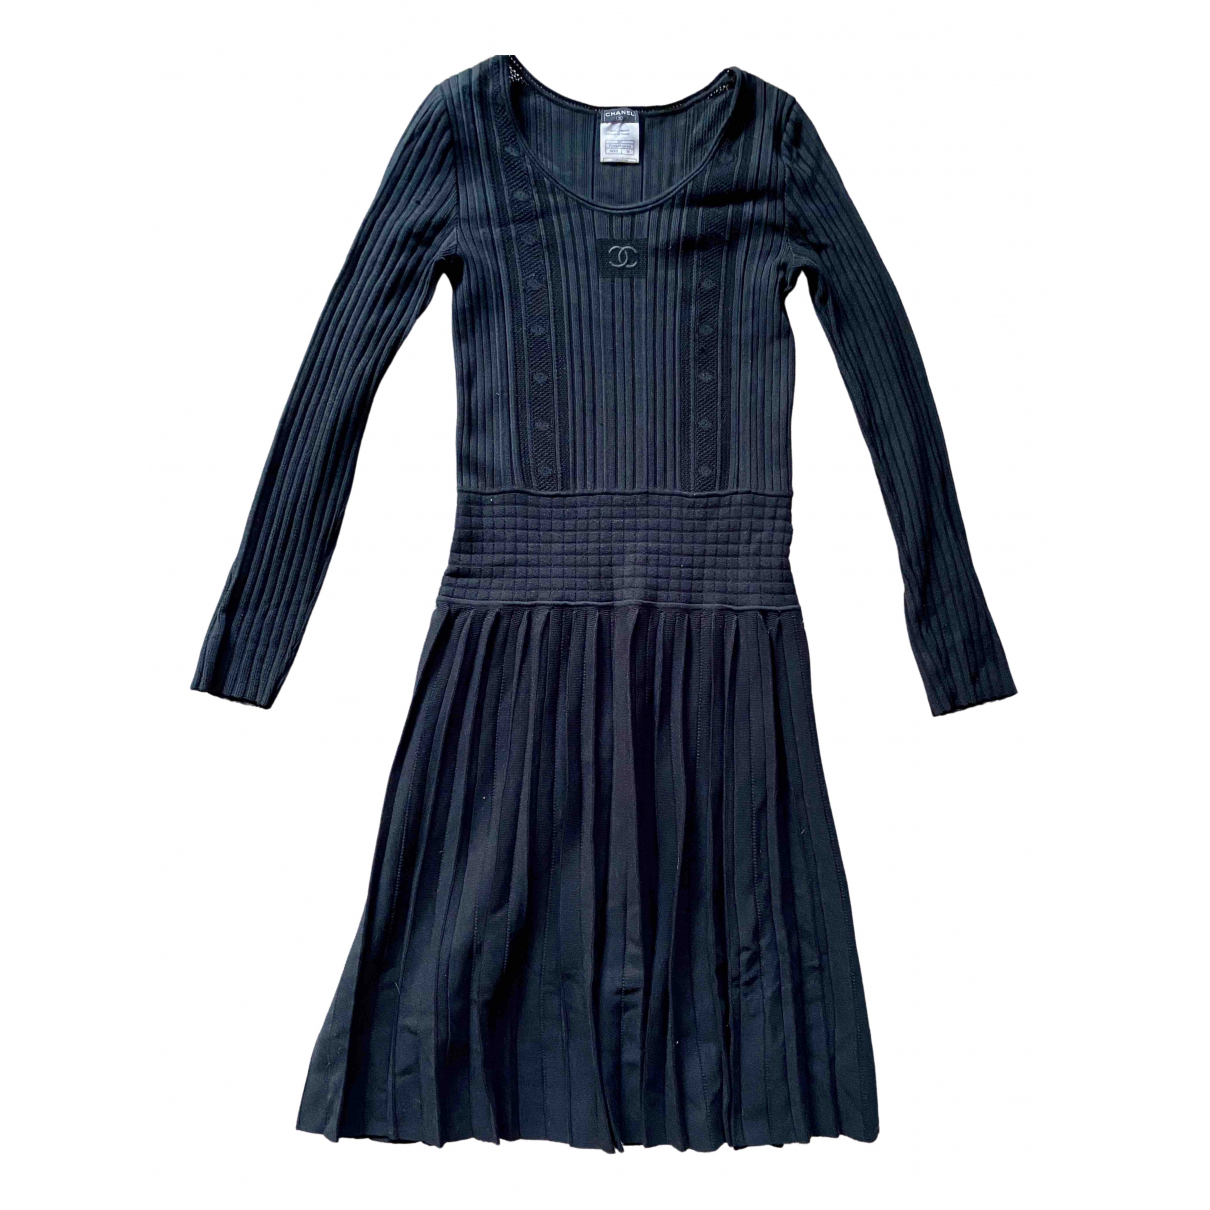 Chanel \N Kleid in  Schwarz Viskose